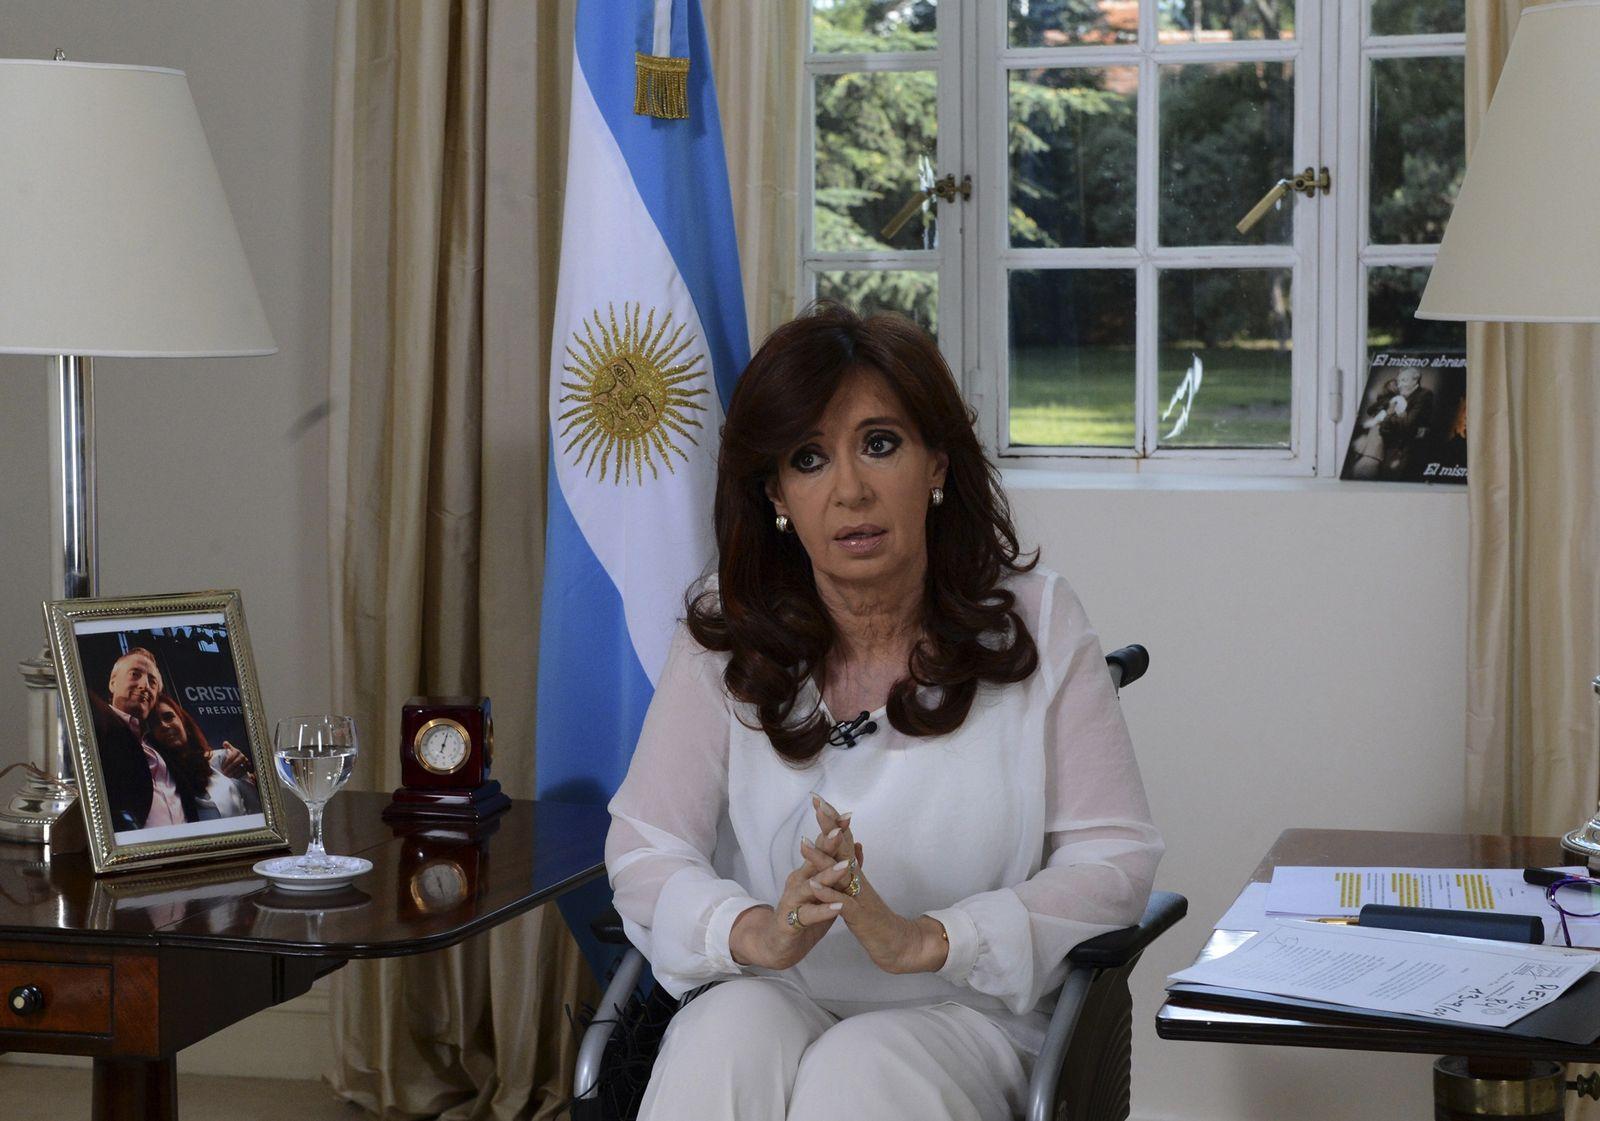 ARGENTINA-PROSECUTOR/REFORMS